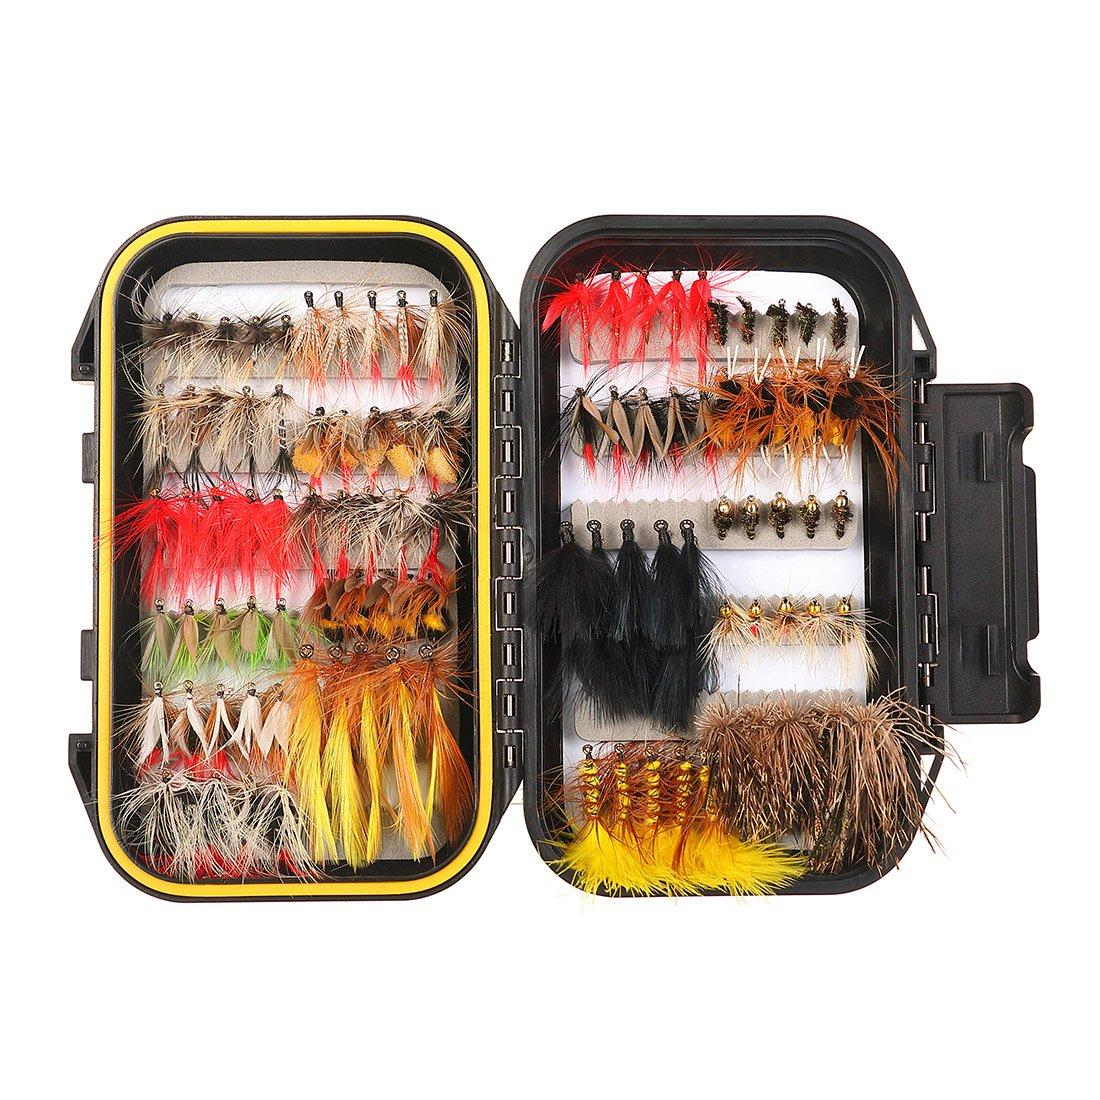 FISHINGSIR 100PCS Fly Fishing Flies Kit Assorted Flies Trout Flies Fly Fishing Lures with Waterproof Fly Box